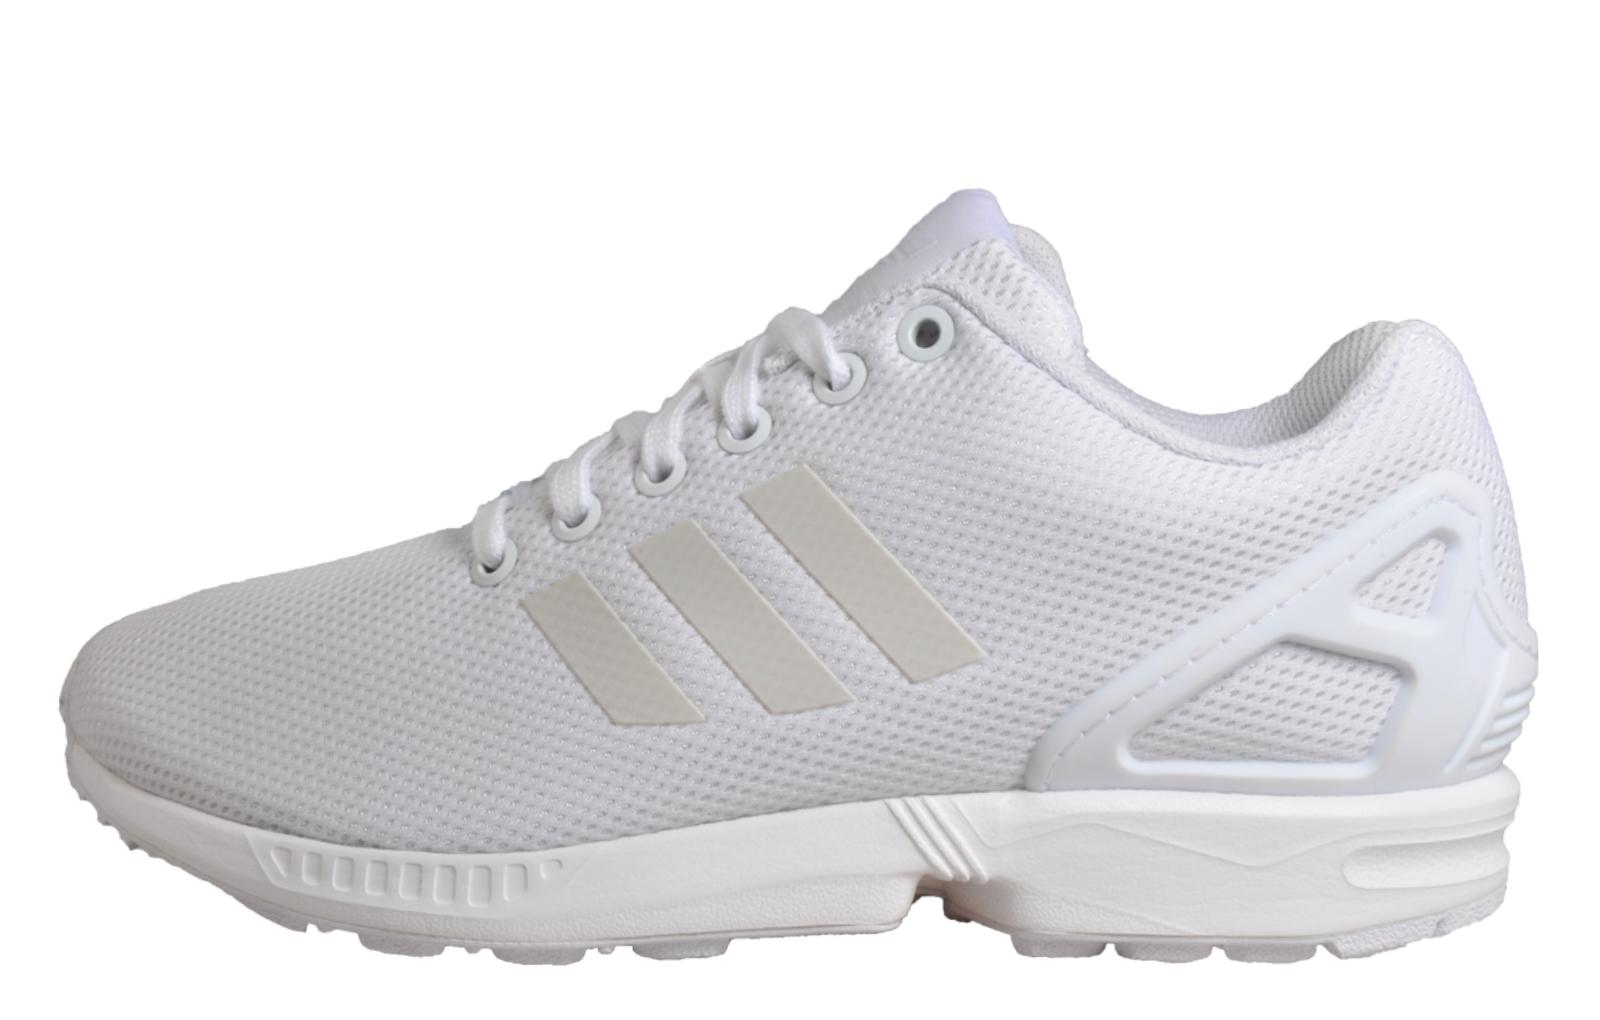 271fe5c6f6fff White   White   White. Adidas Originals ZX Flux Uni - AD169748